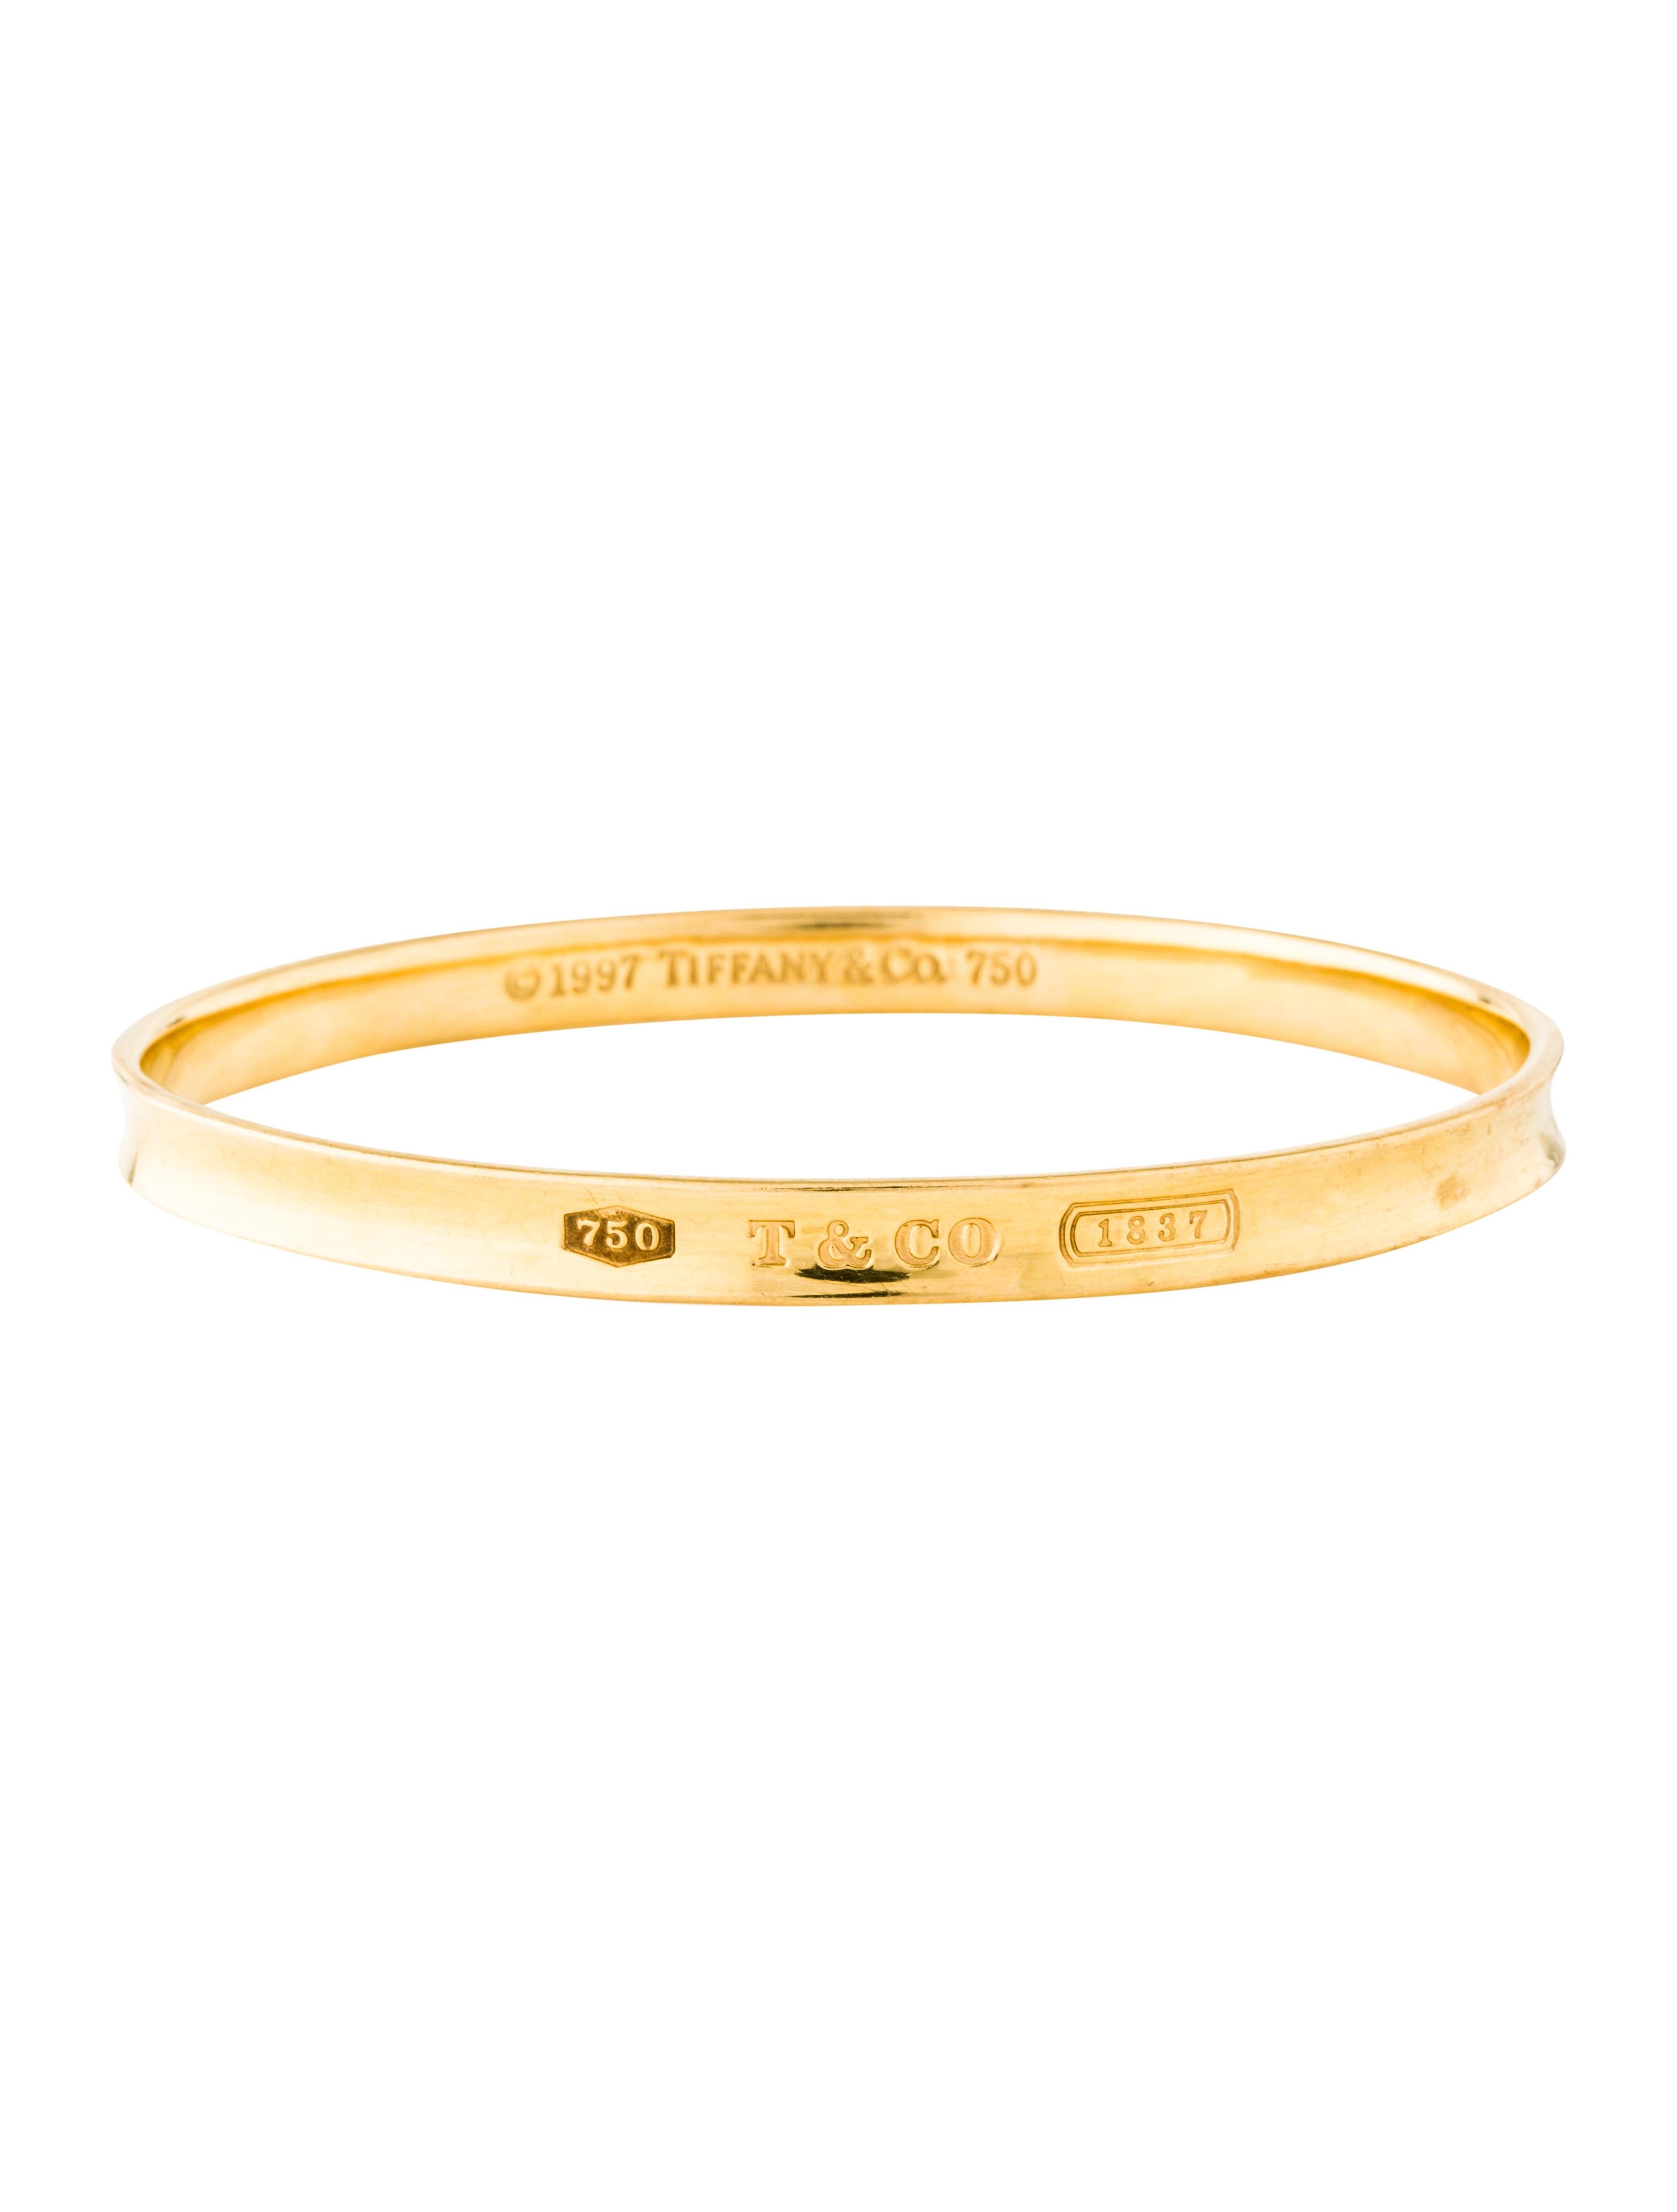 d2db7f246 Tiffany & Co. 18K 1837 Bangle - Bracelets - TIF89102 | The RealReal